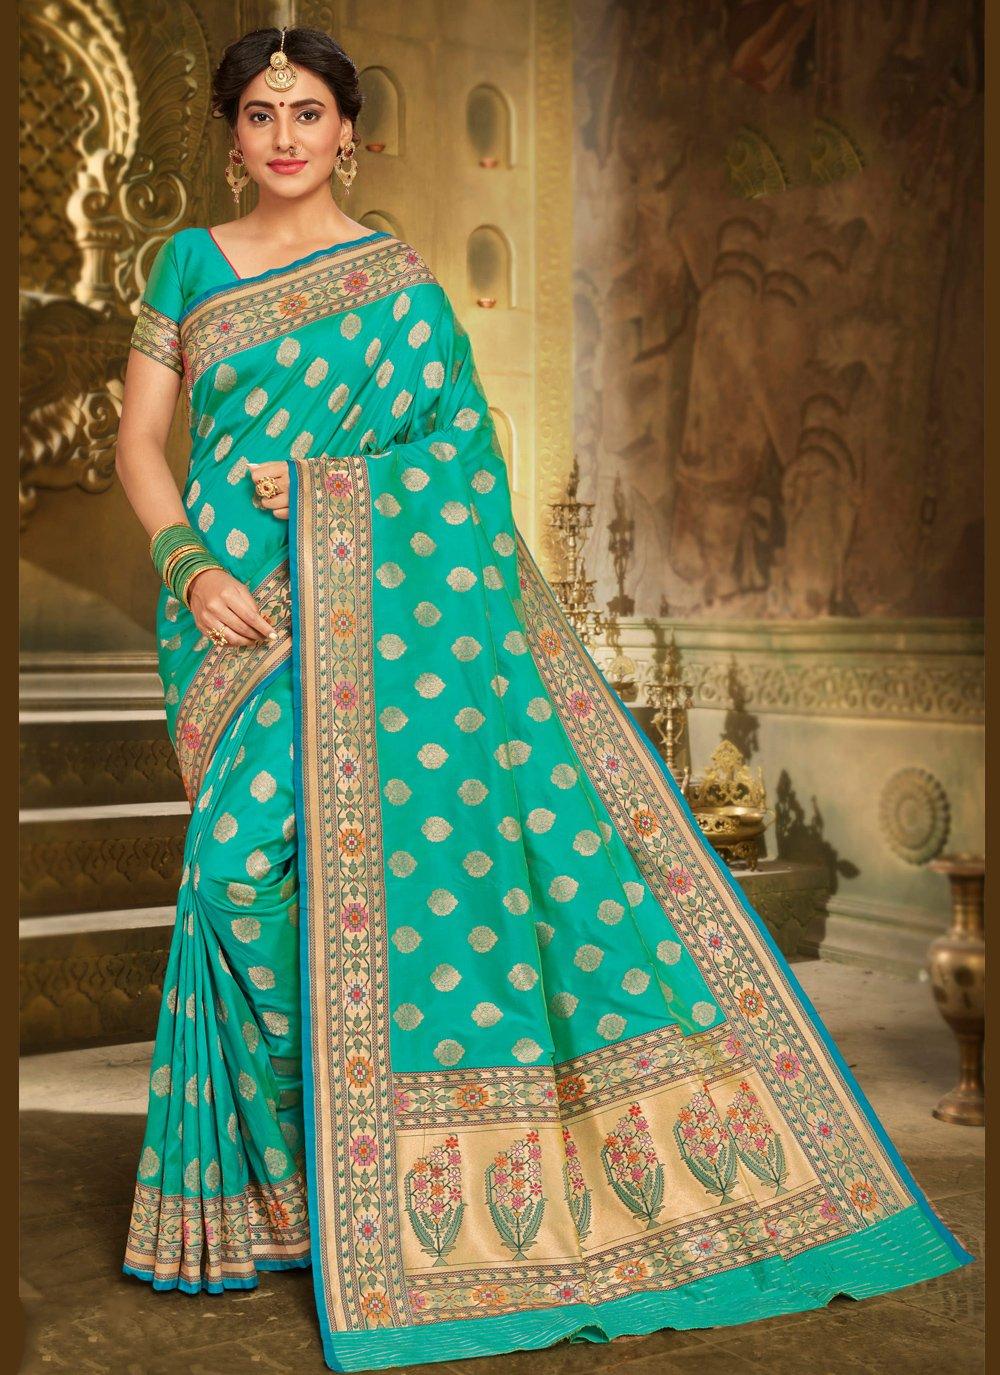 Aqua Blue Embroidered Classic Saree